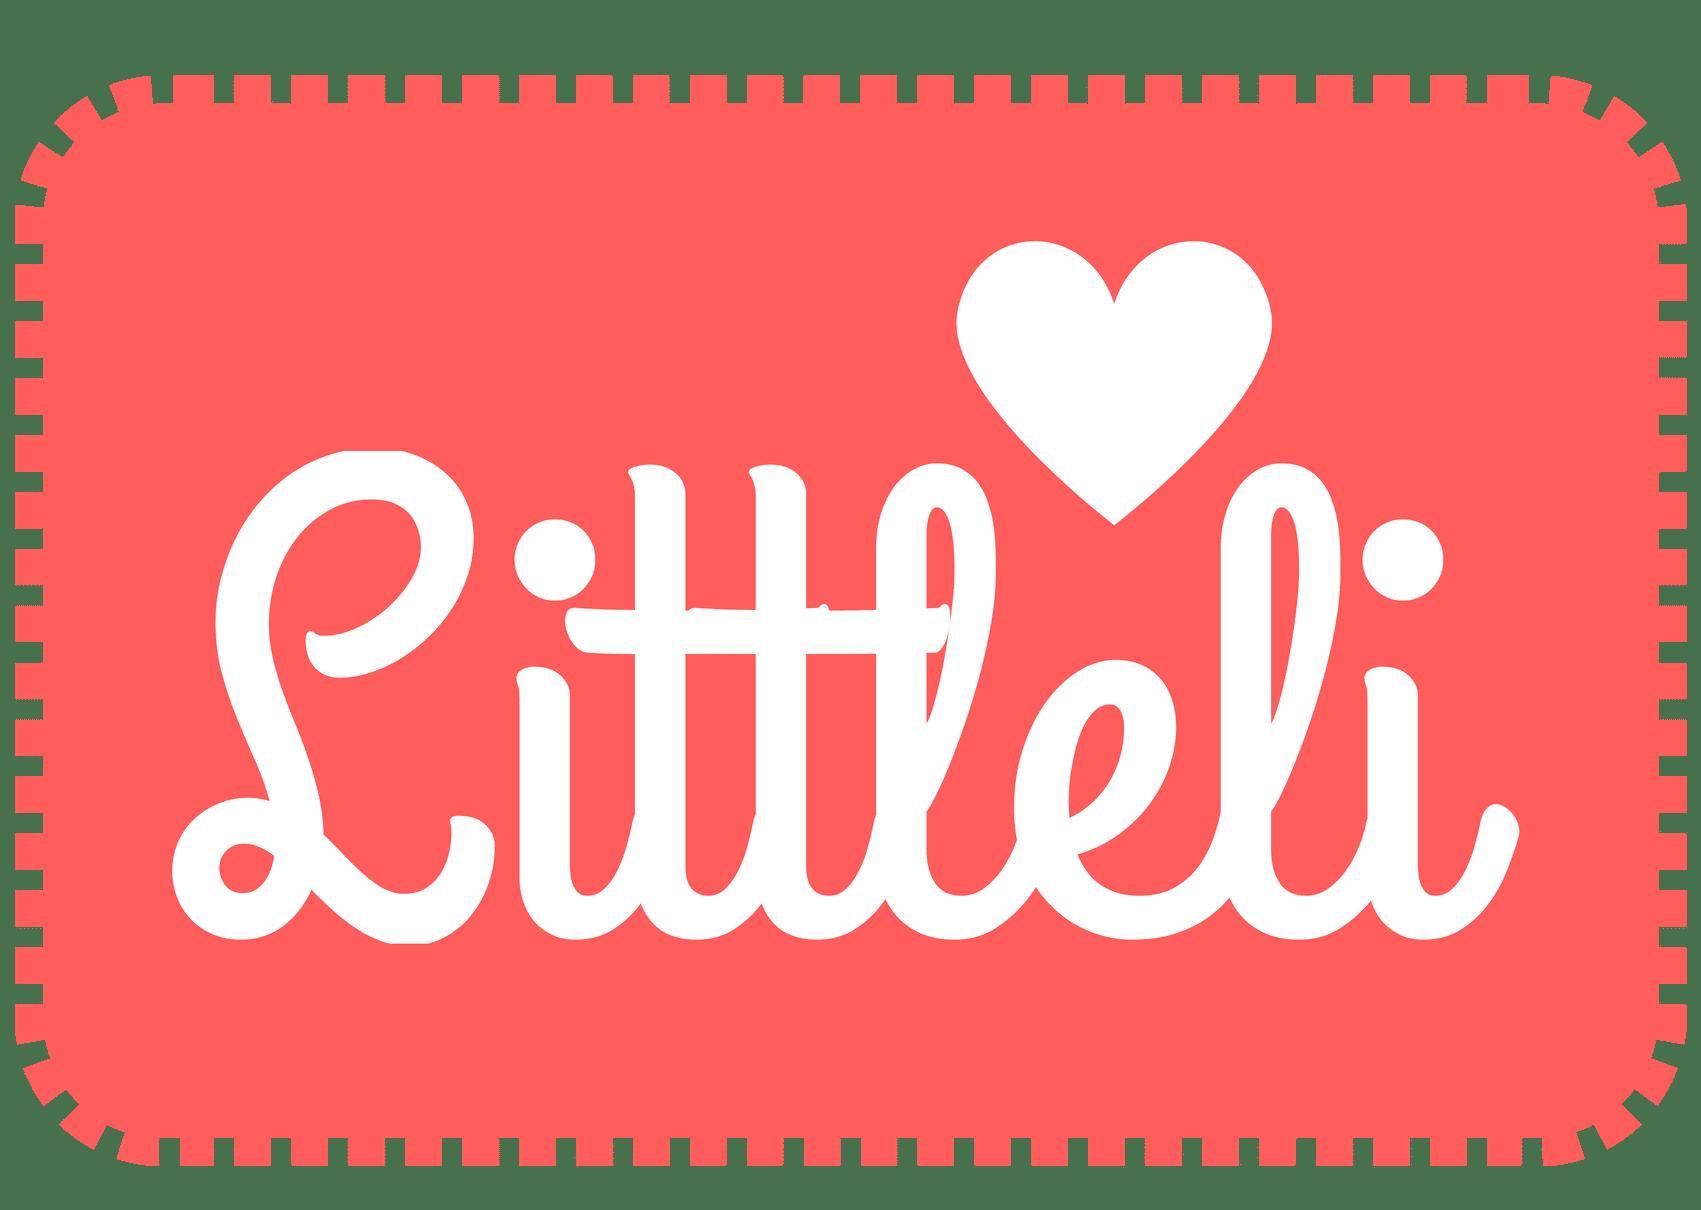 Littleli